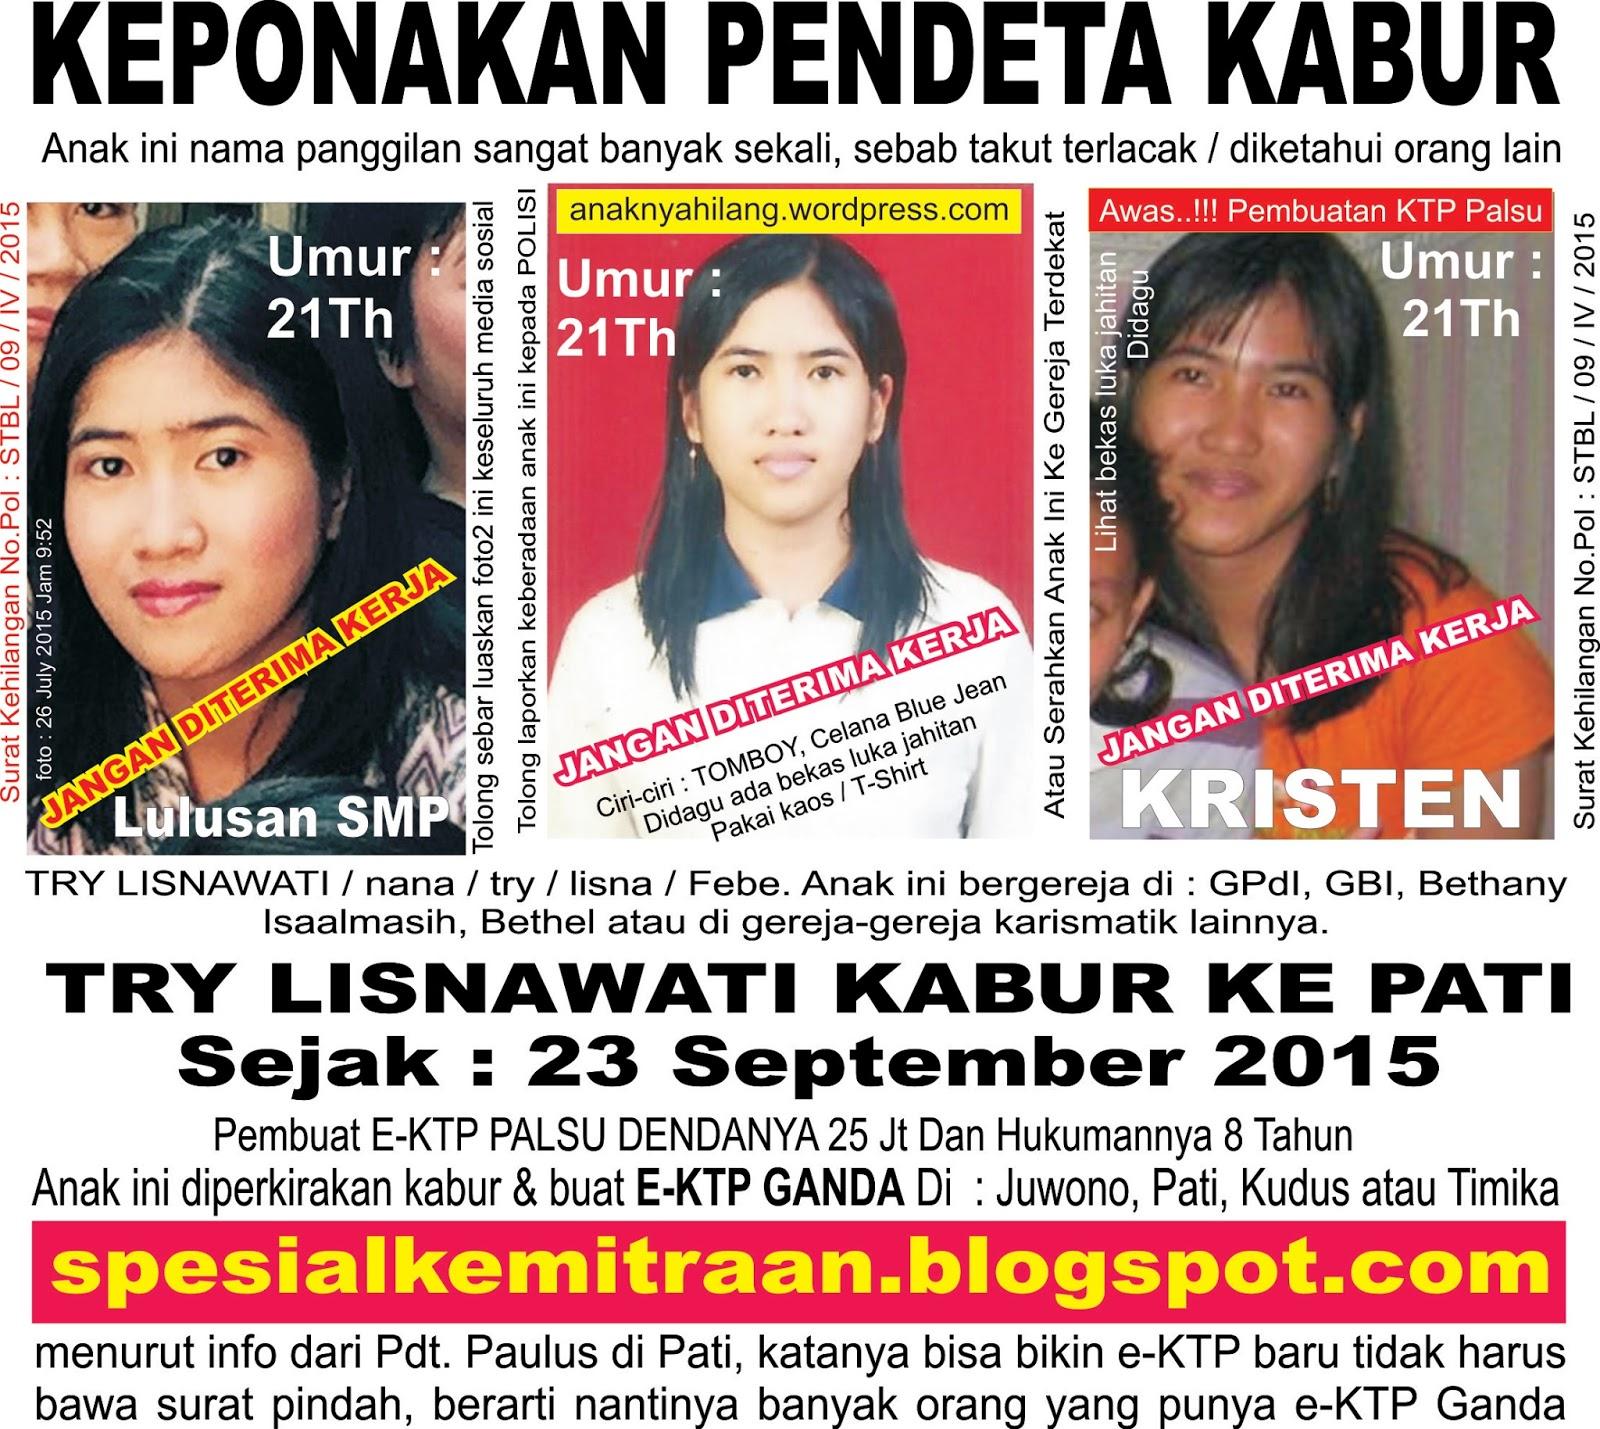 Image Result For Cerita Rakyat Pendek Terkenal